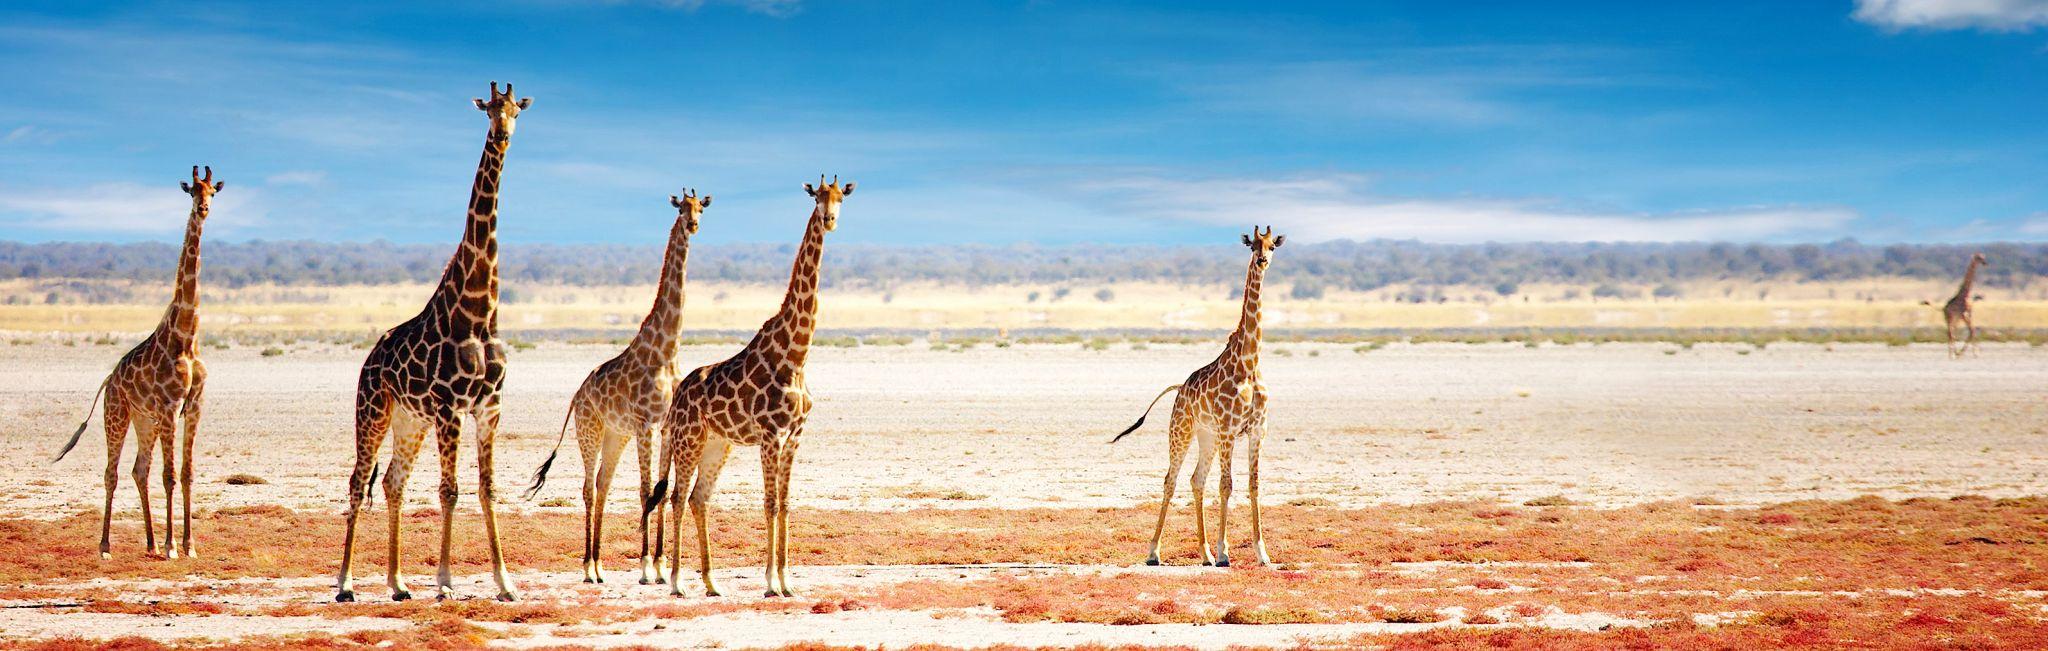 Best Safari Tour Companies Kenya